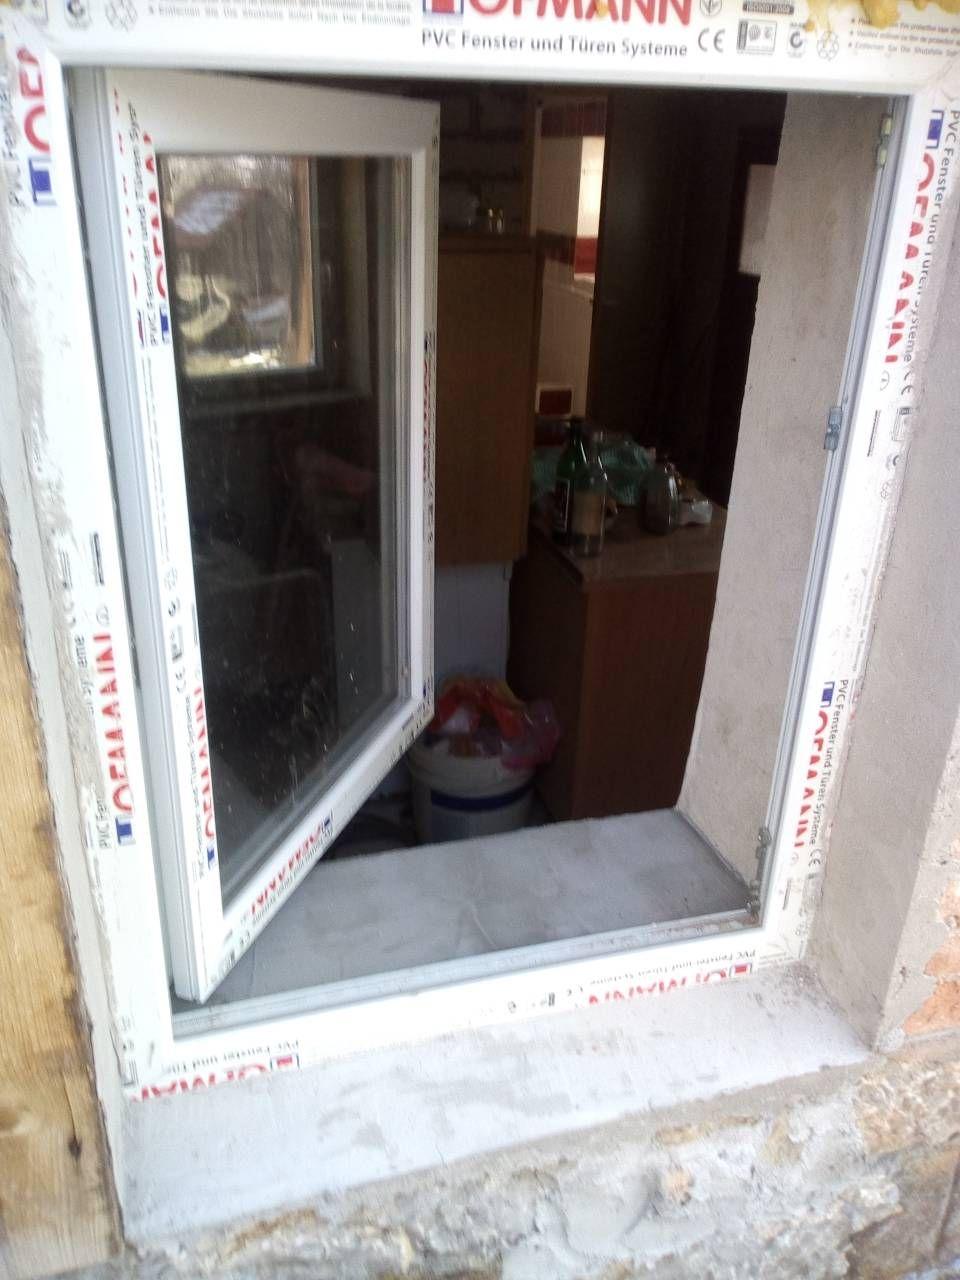 Отворен прозор, стакло остало читаво